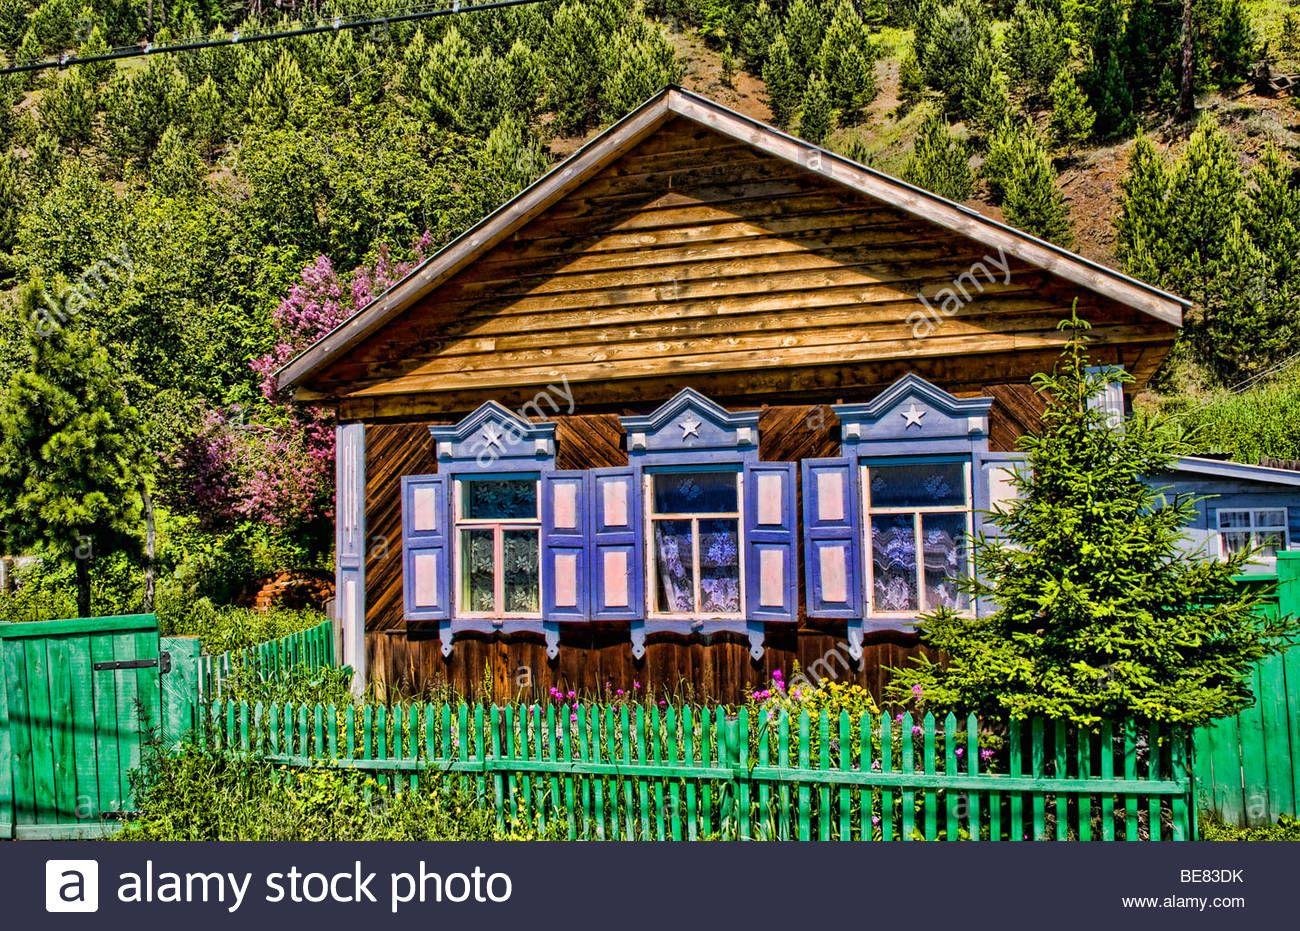 Beautiful old wooden houses with shutters in famous style Listvyanka near Irkutsk in Siberia Russia Stock Photo